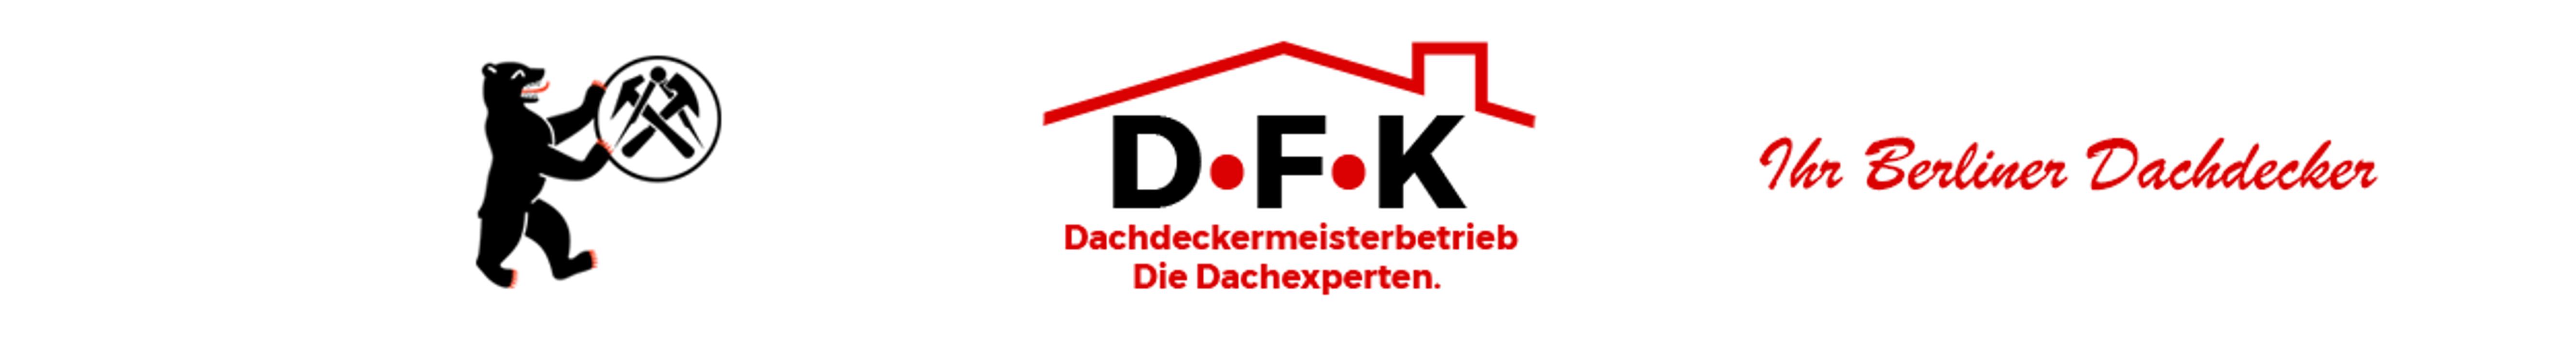 Bild zu D.F.K. Dachdeckermeisterbetrieb Laubinger GbR in Berlin